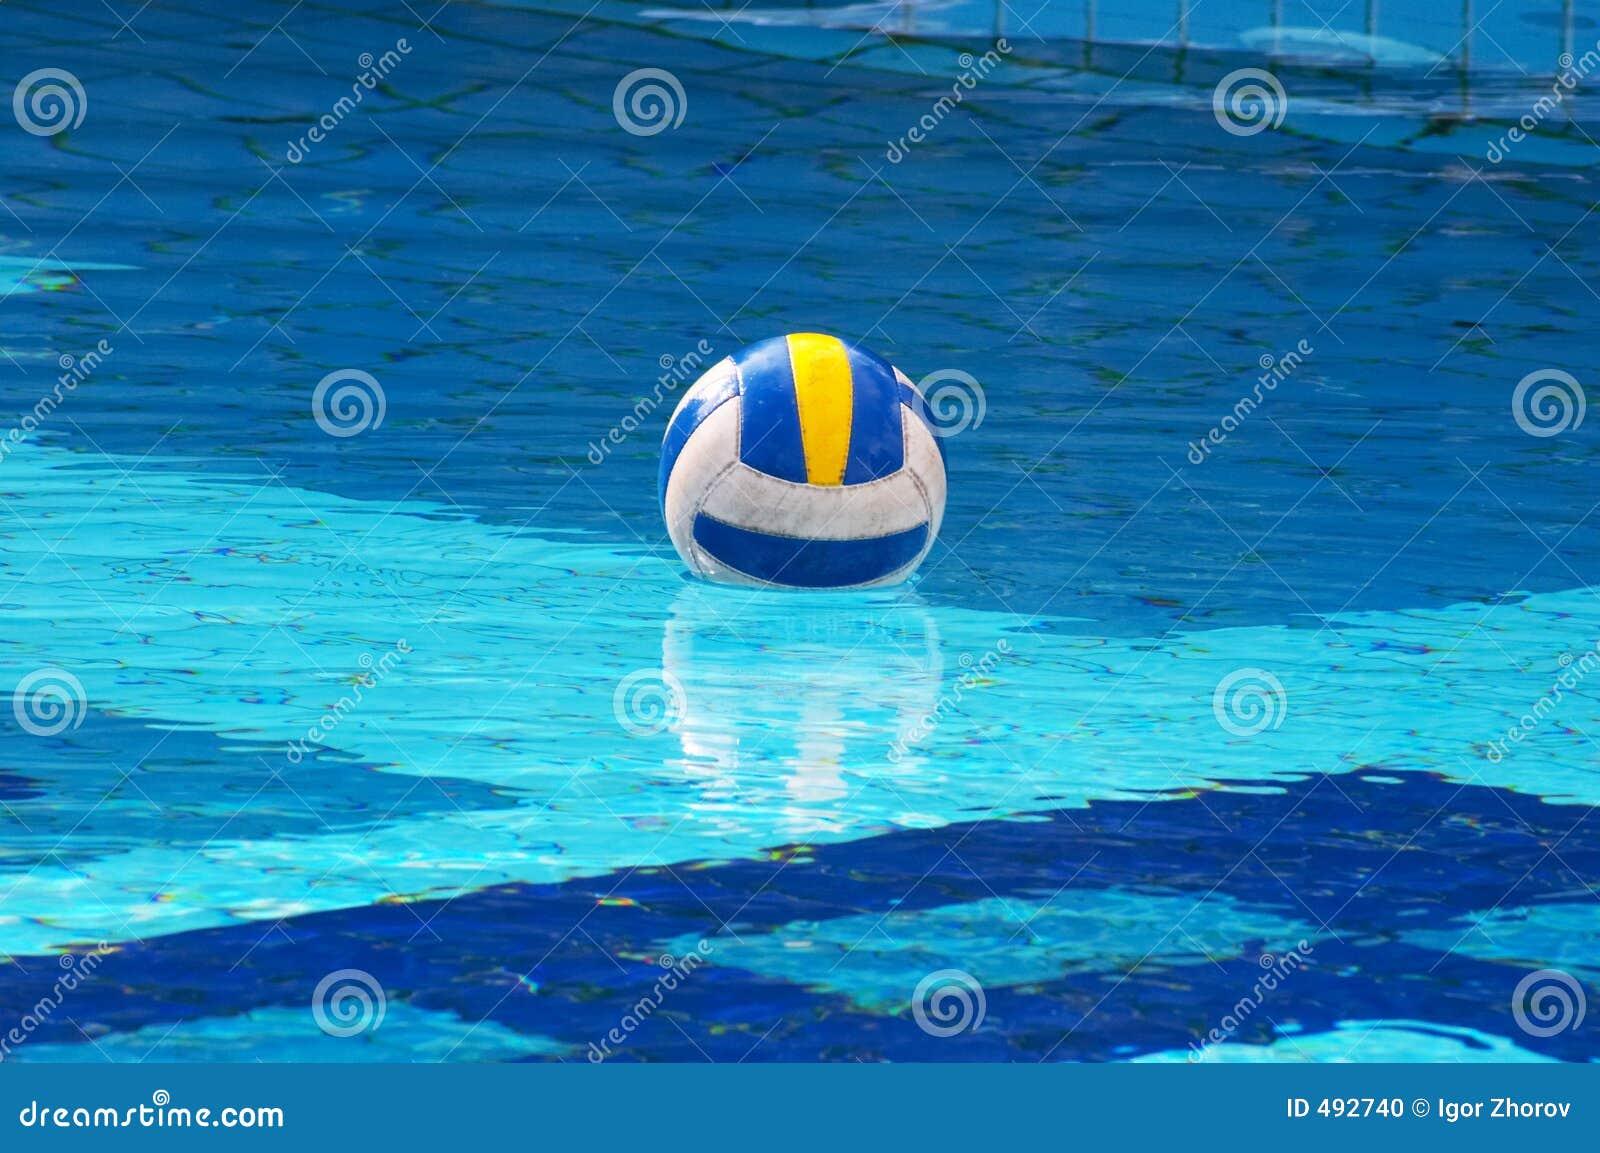 Ball pool swimming